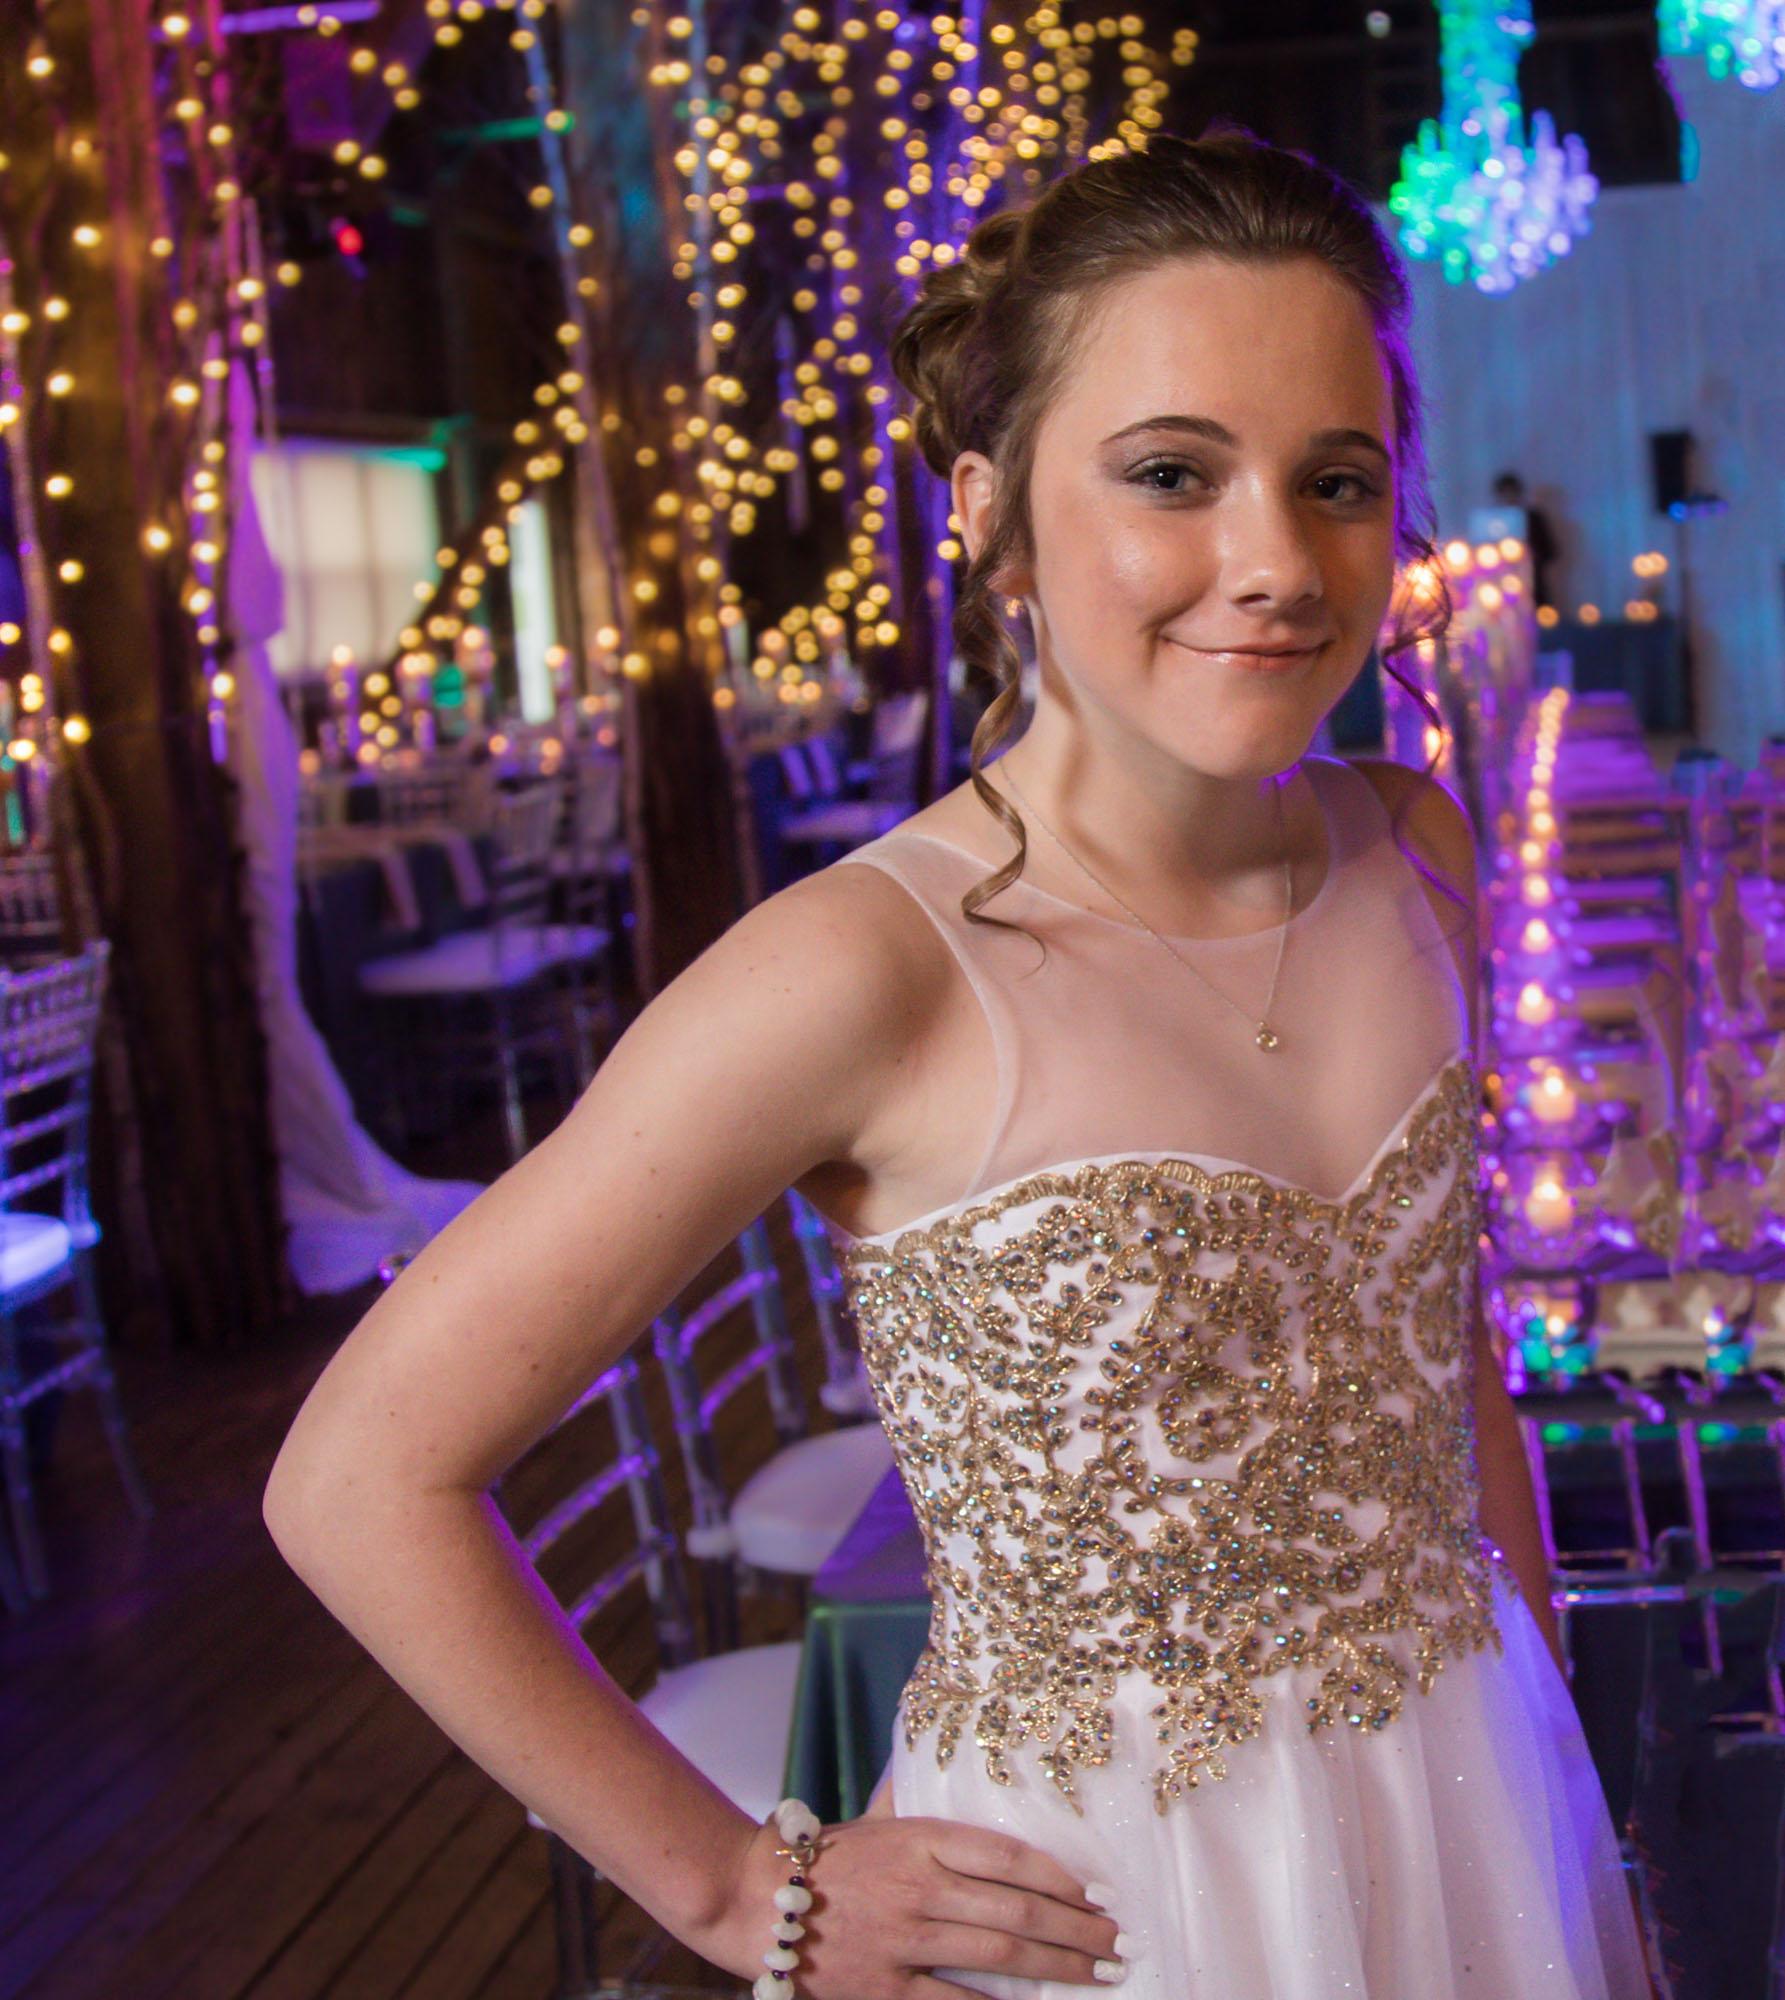 scranton_wedding_photographer_lettieri_pa (25 of 27).jpg